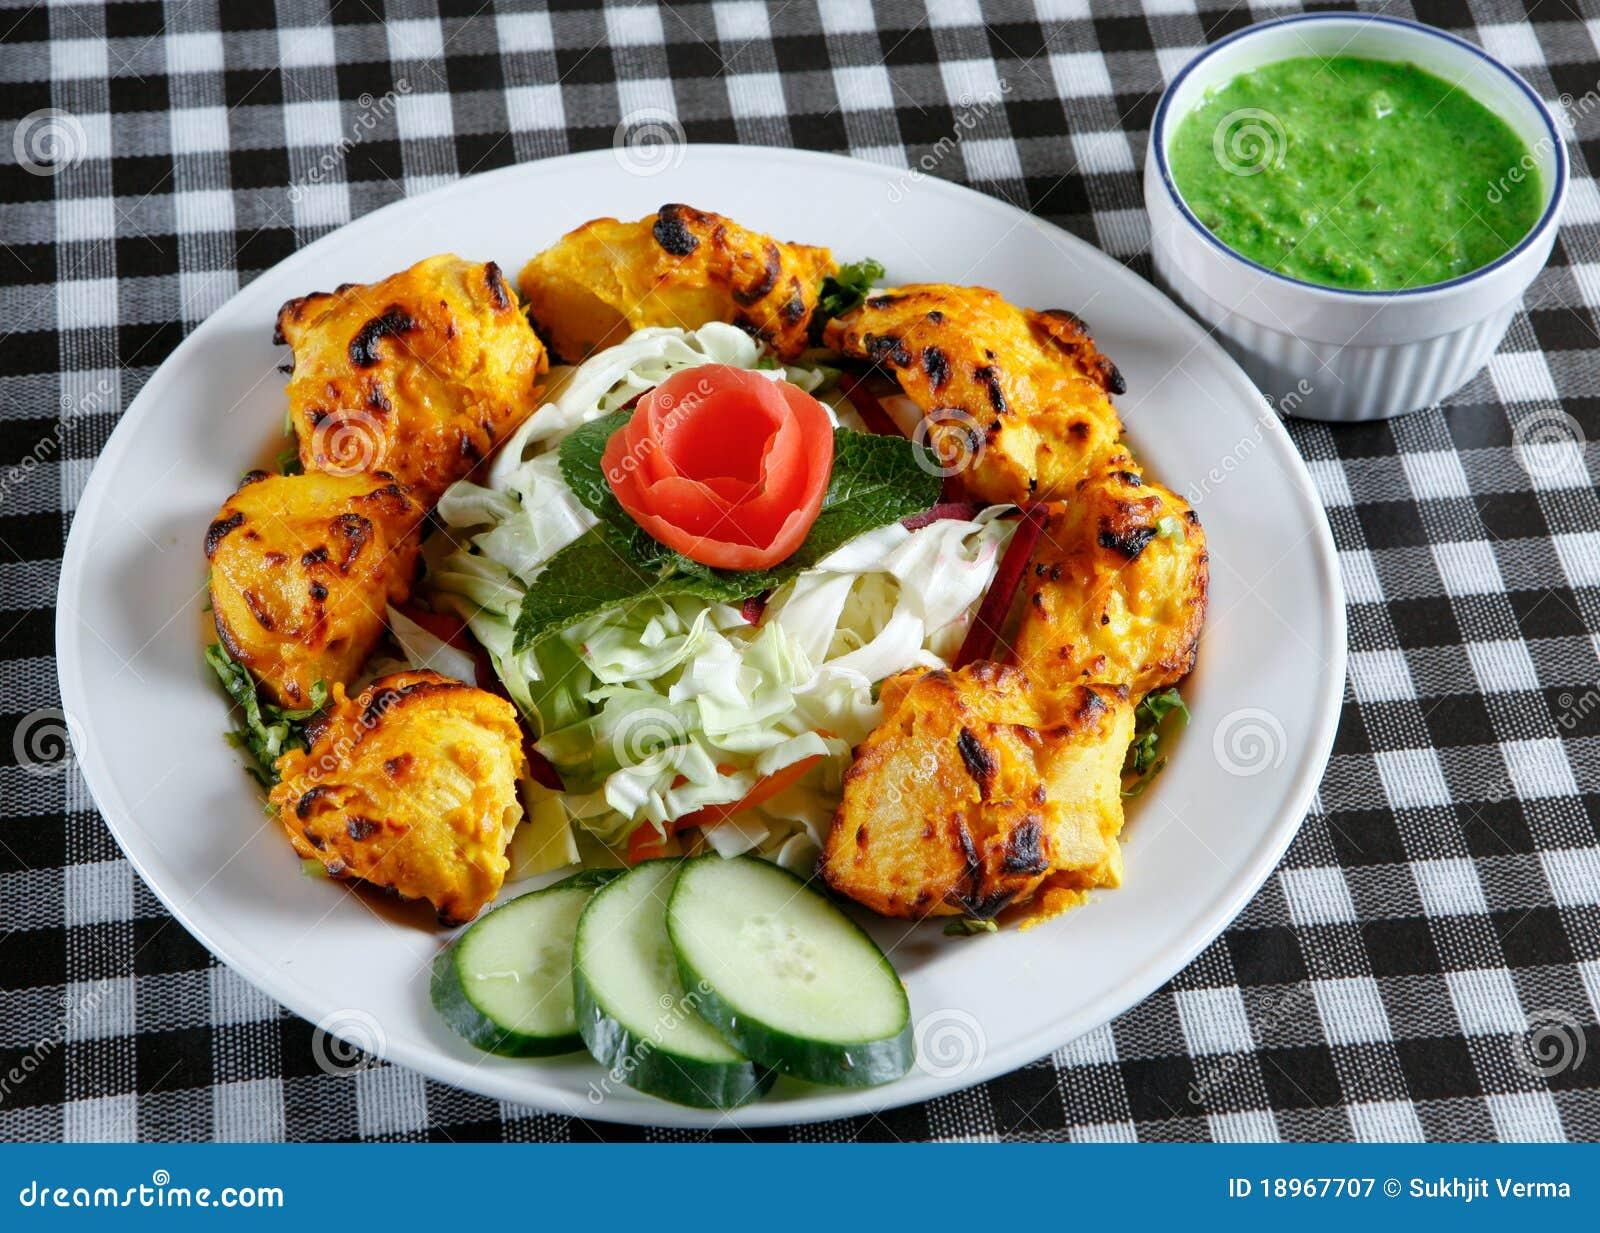 chicken-tikka-salad-sauce-18967707.jpg